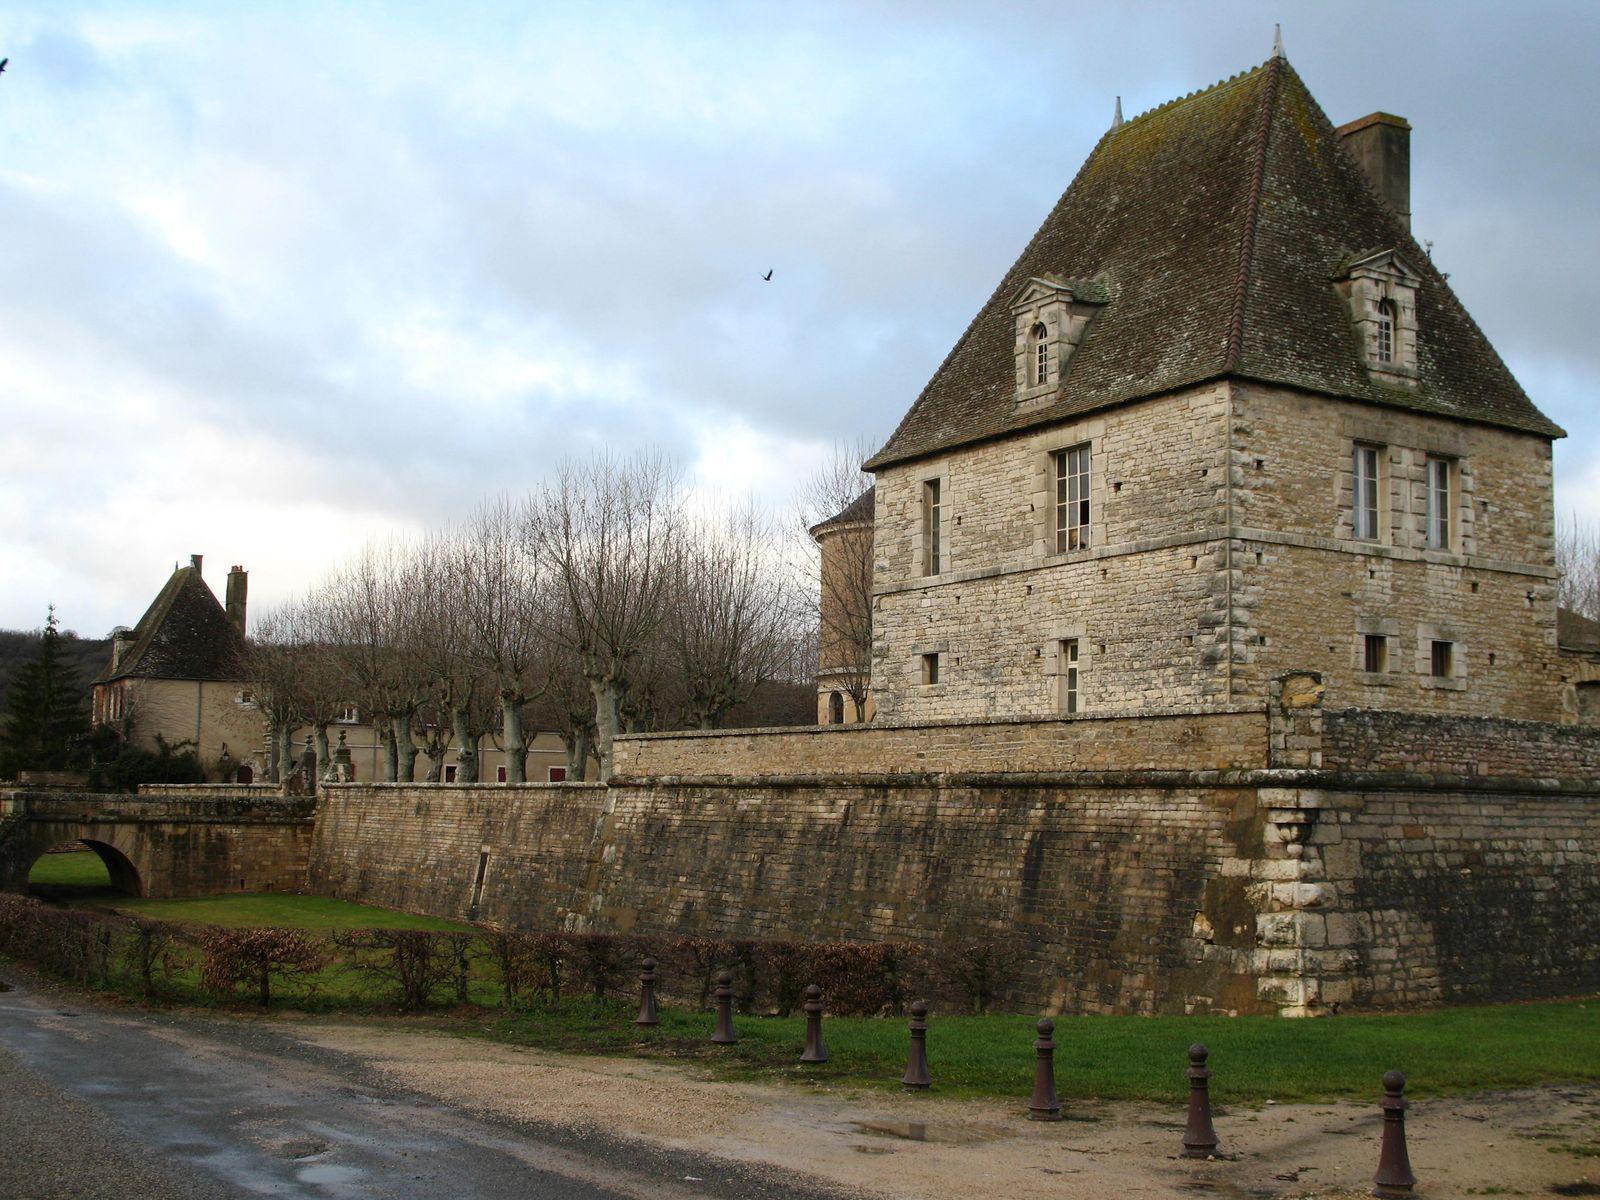 Sennecey-le-Grand